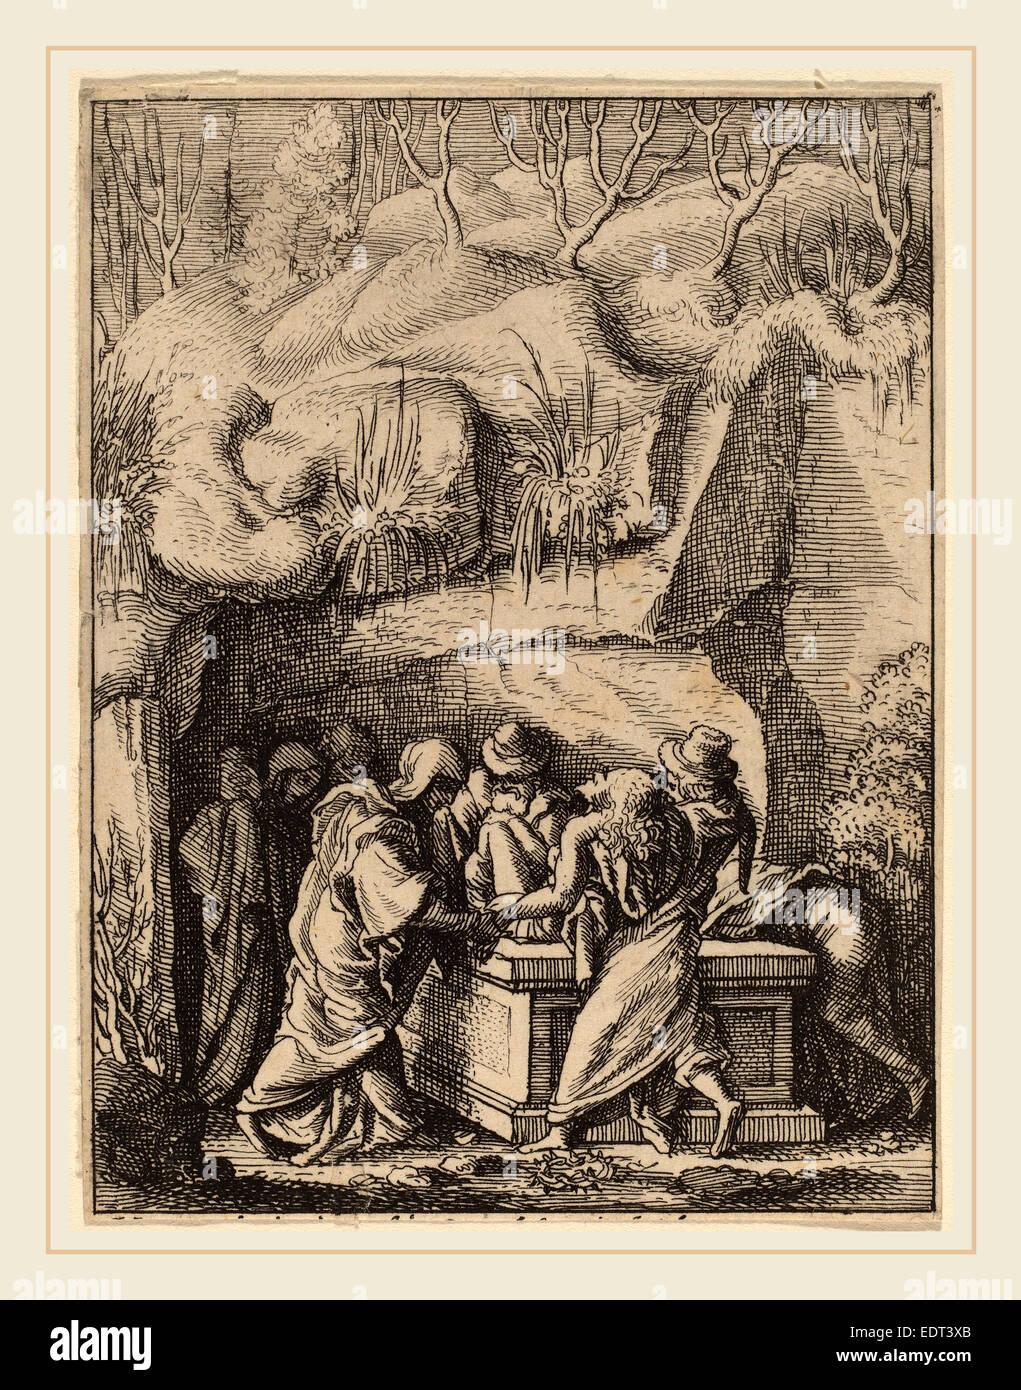 Wenceslaus Hollar (Bohemian, 1607-1677), The Entombment, etching - Stock Image